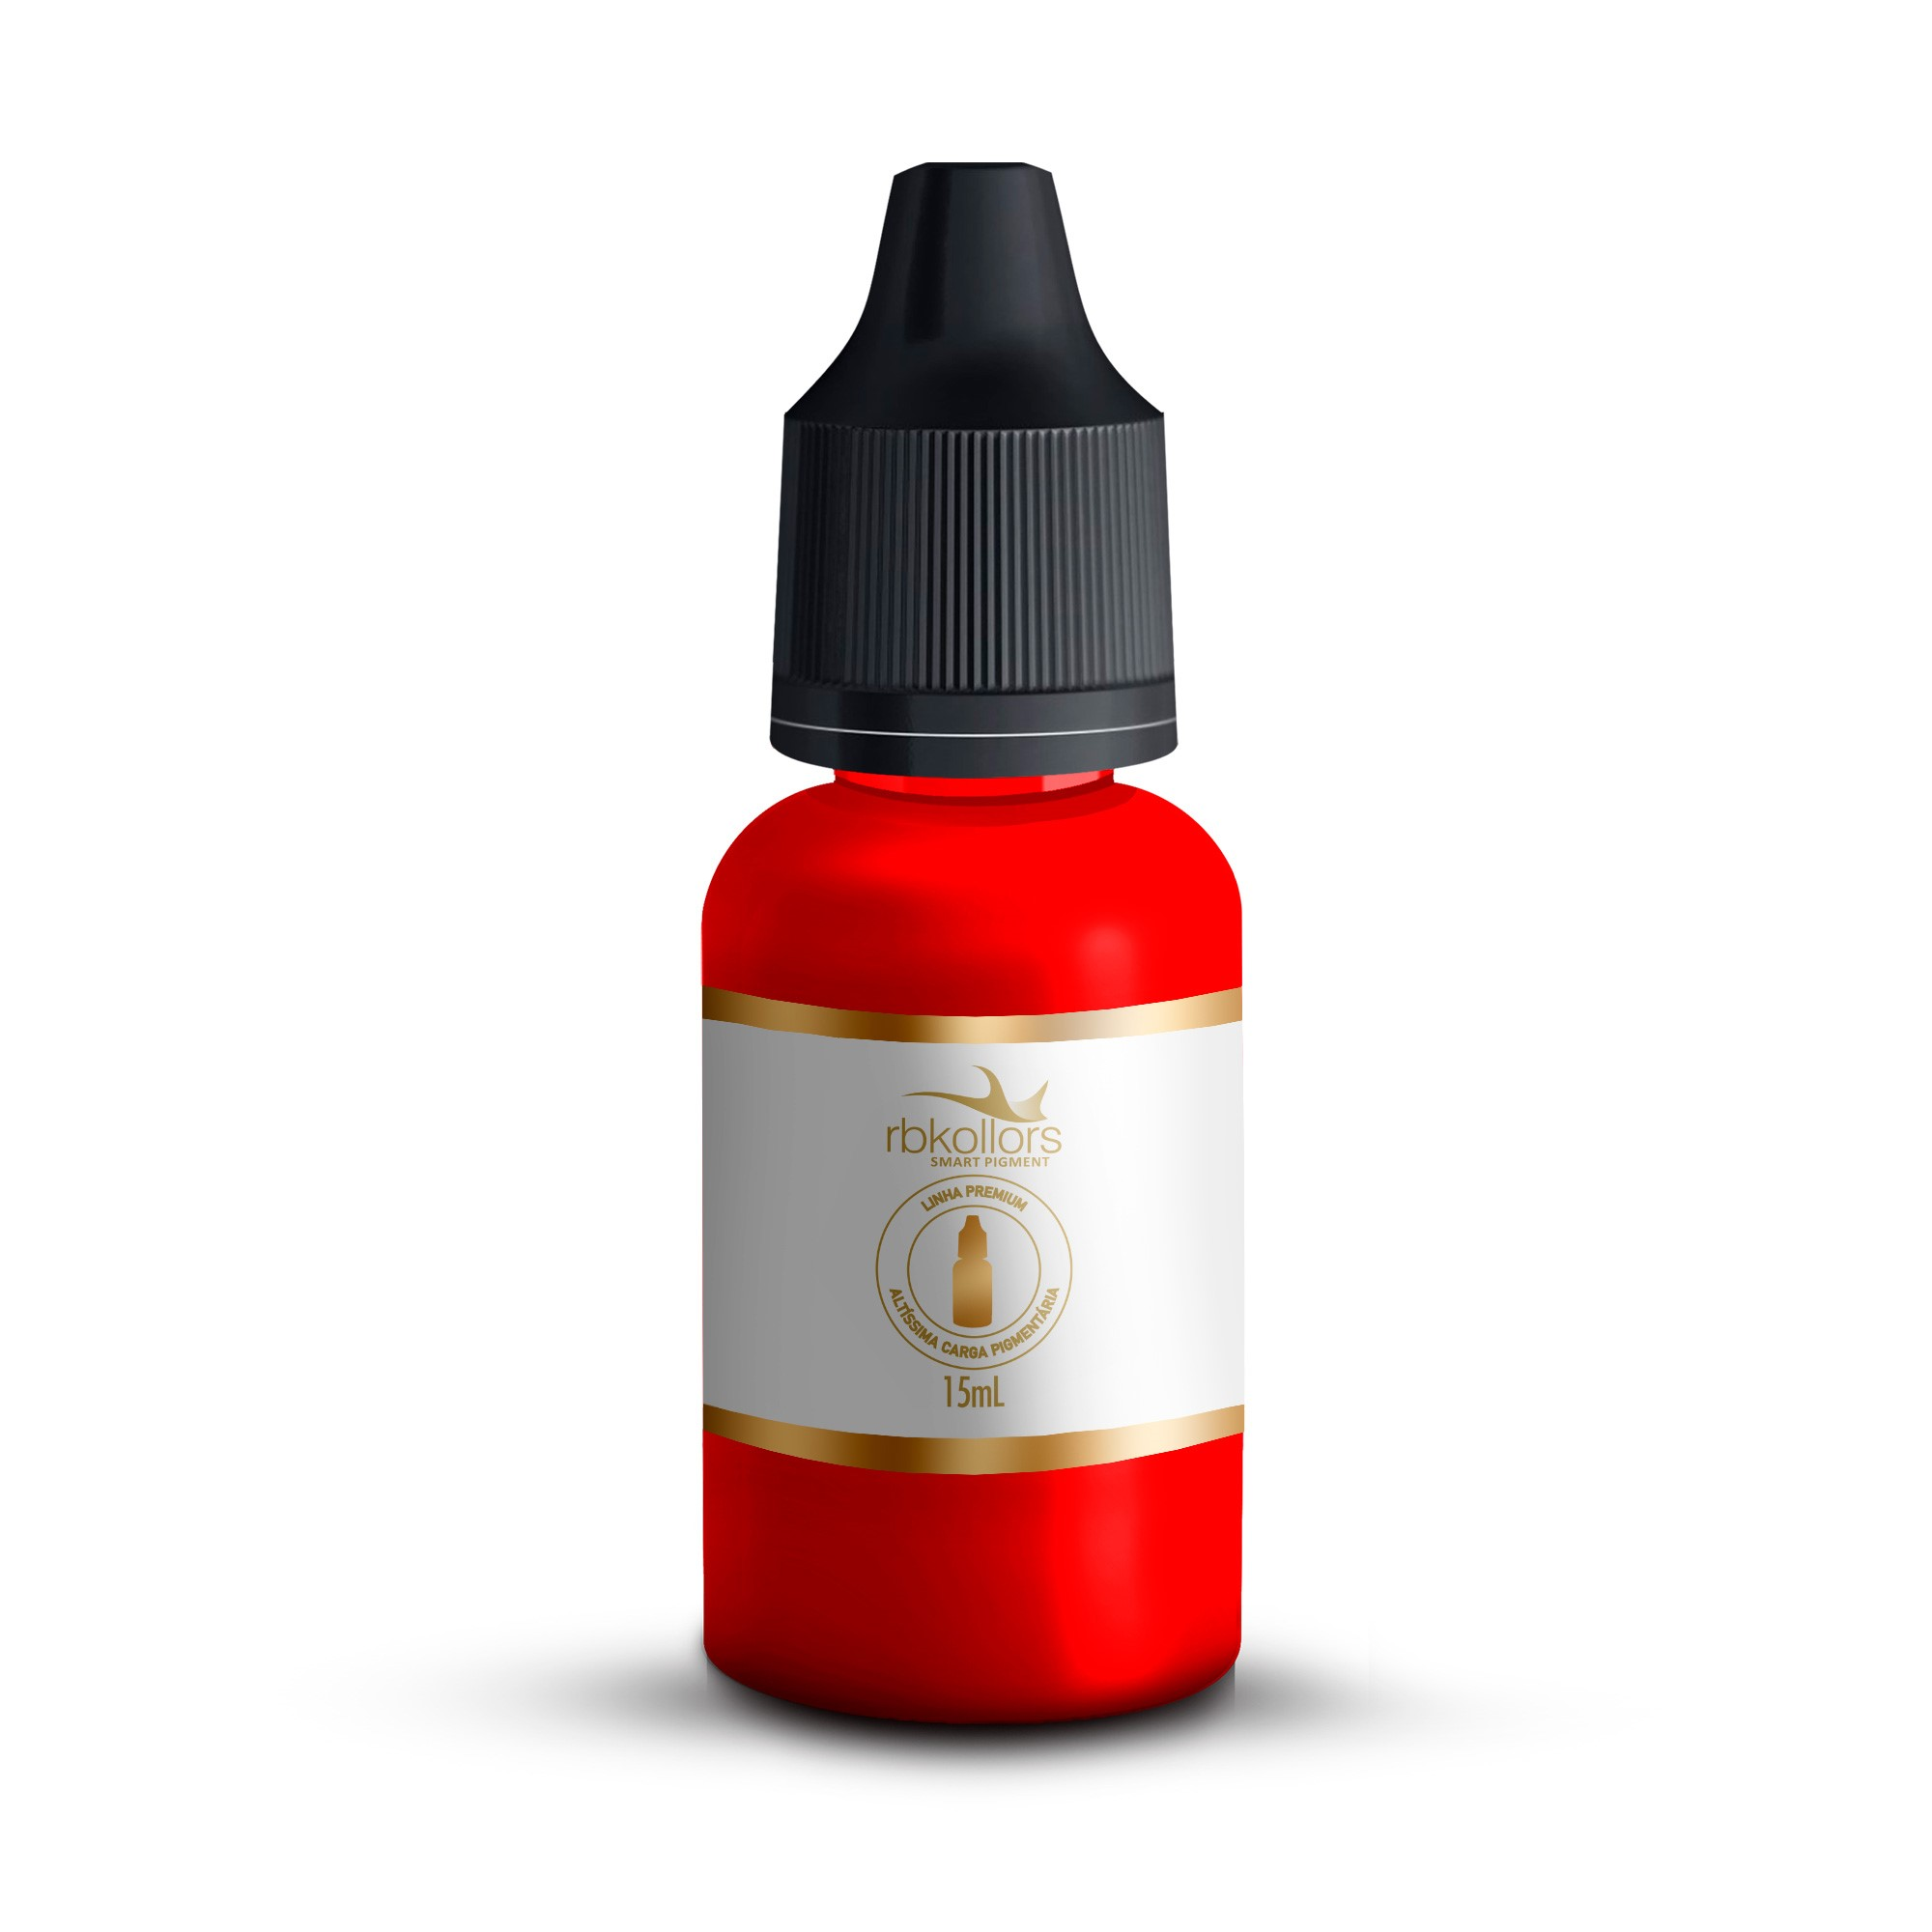 Pigmento Orgânico RB Kollors 15 ml - Vermelho Insano (Linha Premium)  - Tebori Nordeste